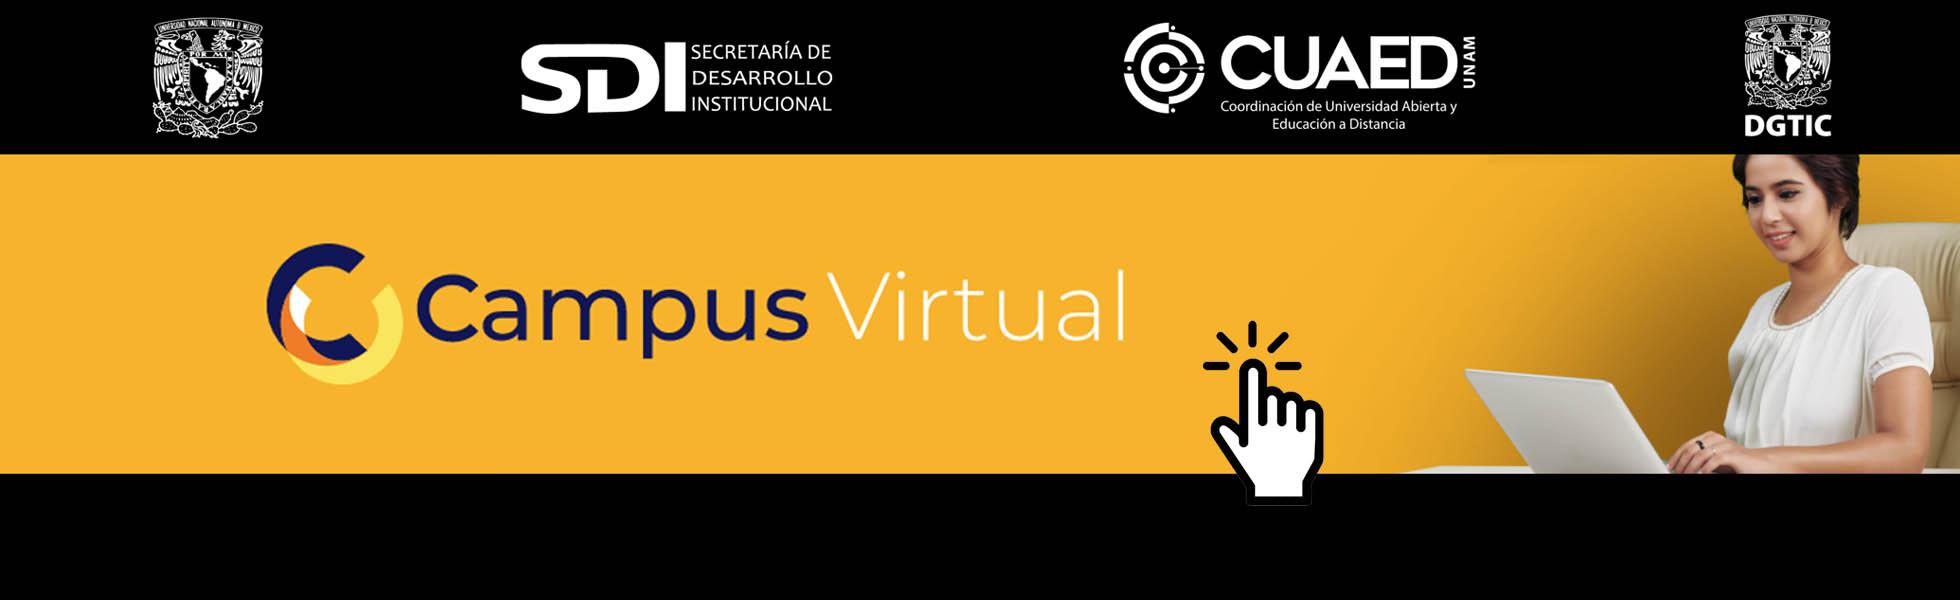 CUAED Campus Virtual